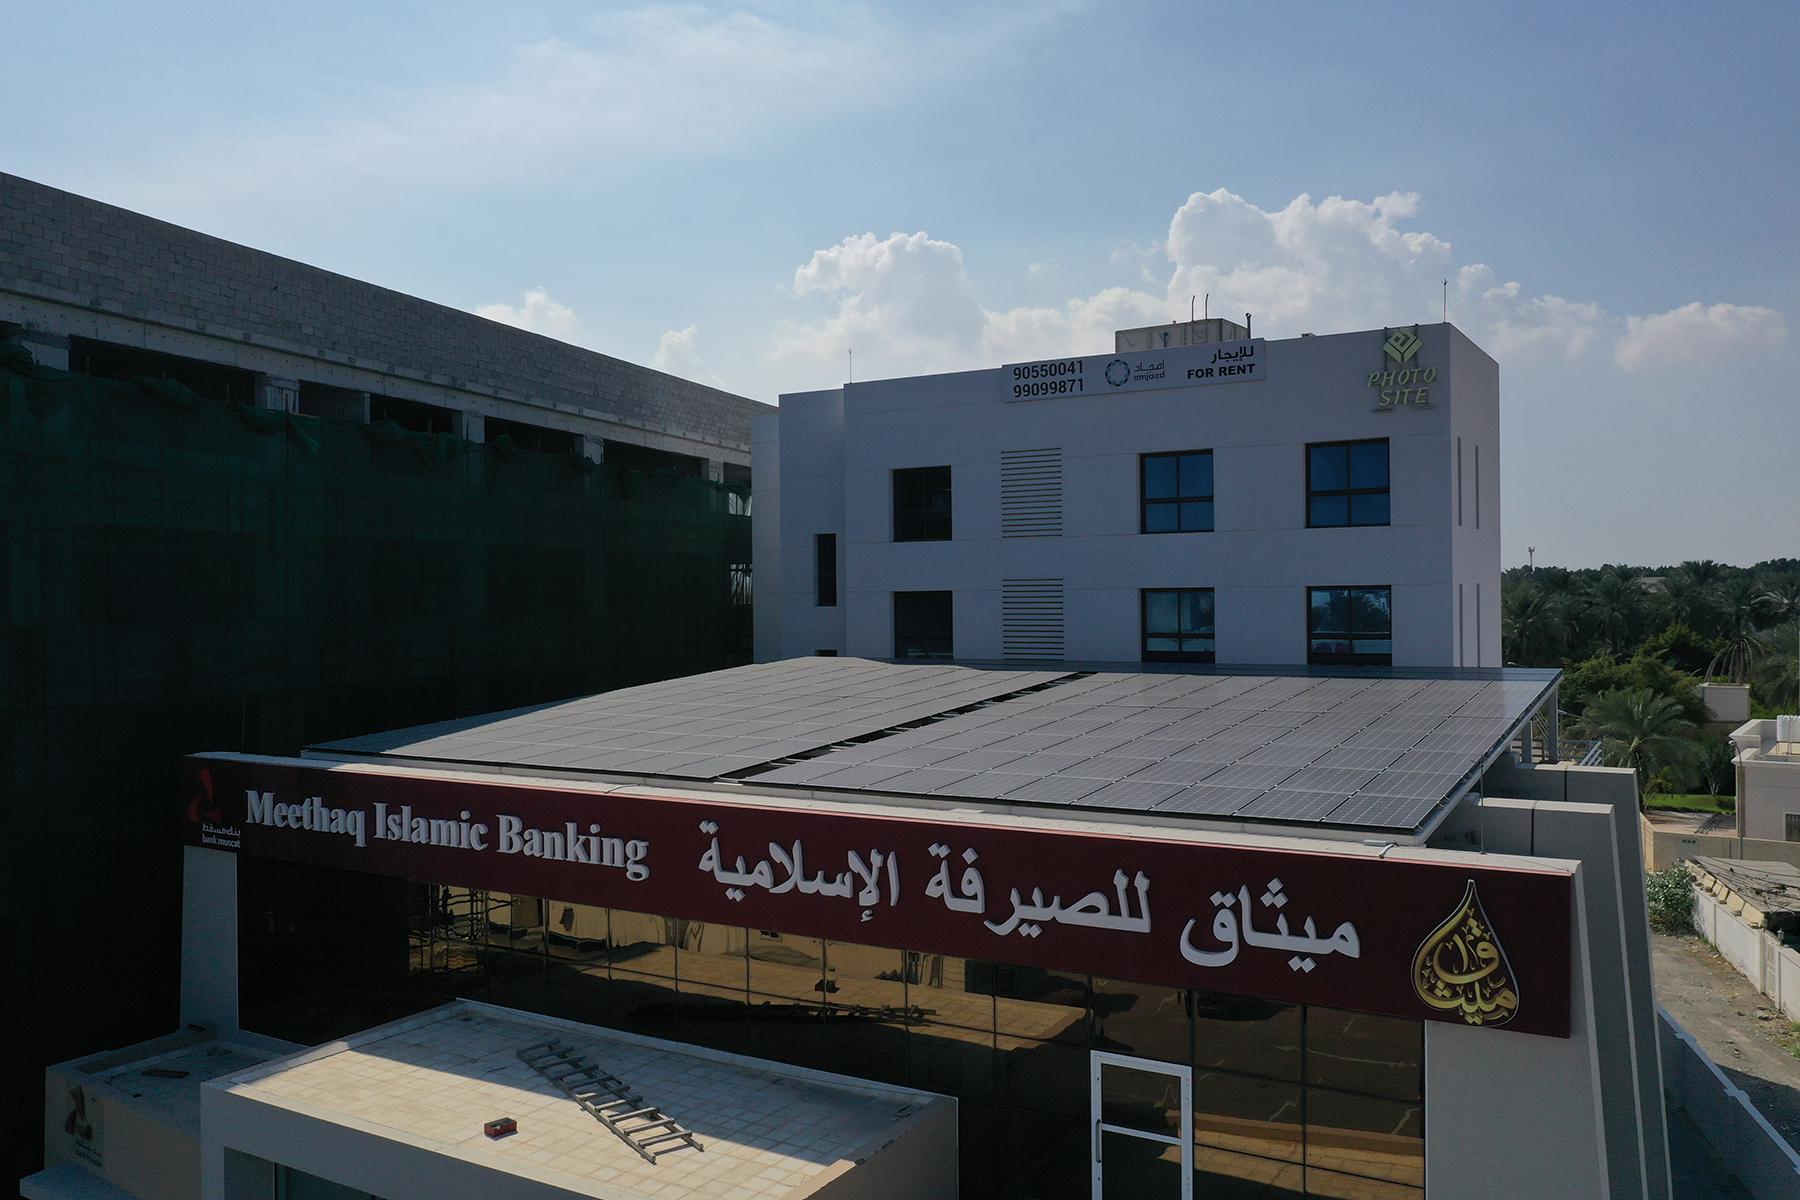 Methaq Islamic Banking Buildings – Al-Khoud branch